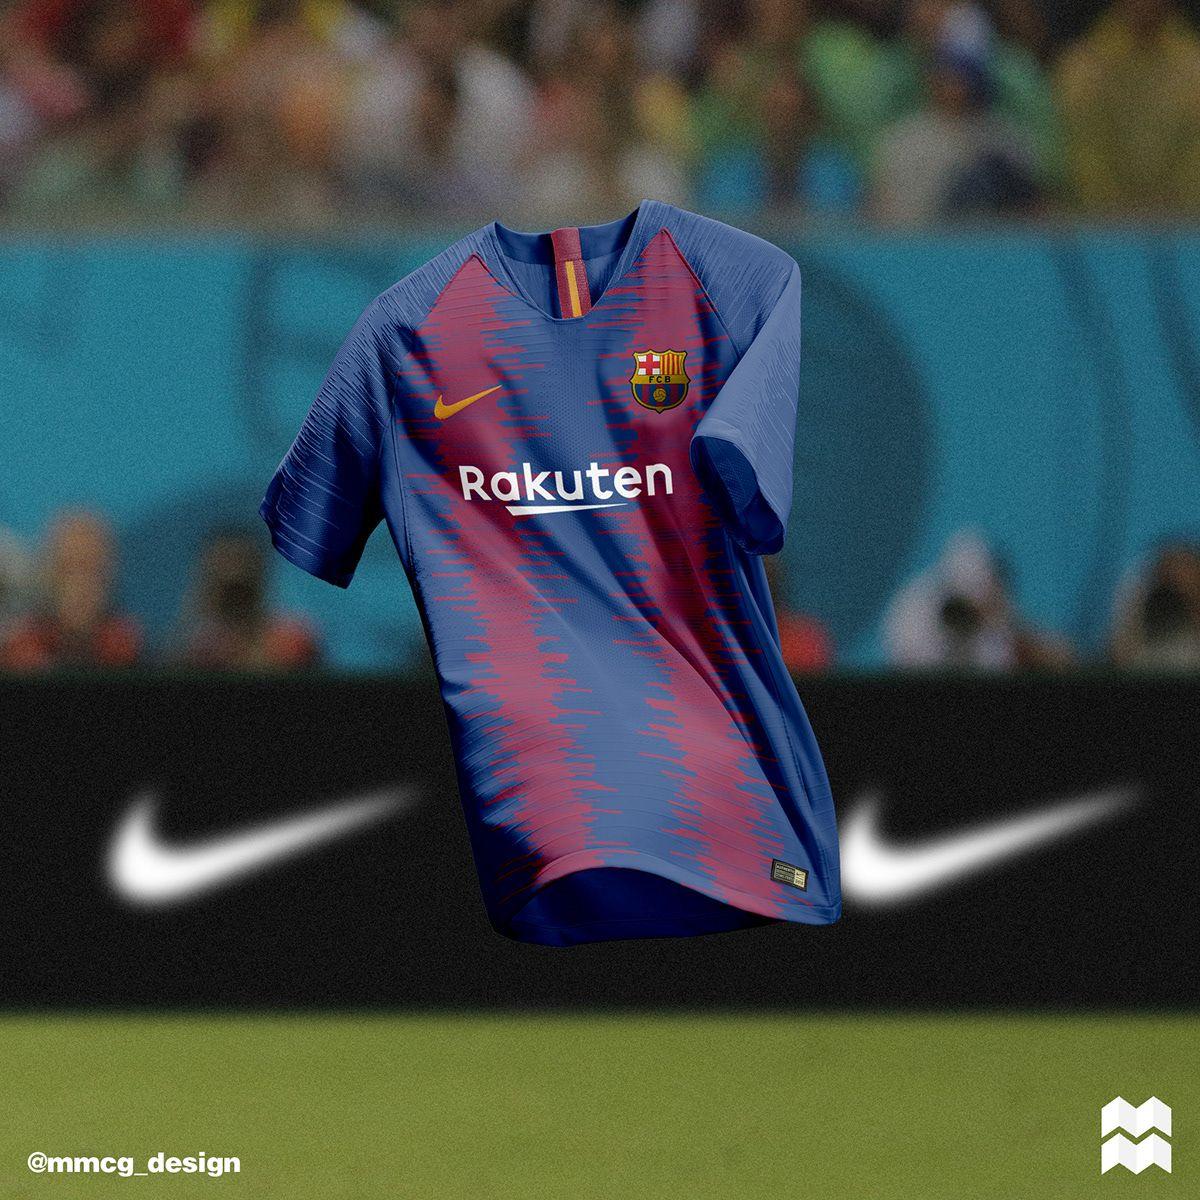 Nike F C Barcelona Home Away Jerseys 2018 19 On Behance Camisa De Futbol Camisetas Deportivas Camisas De Futbol